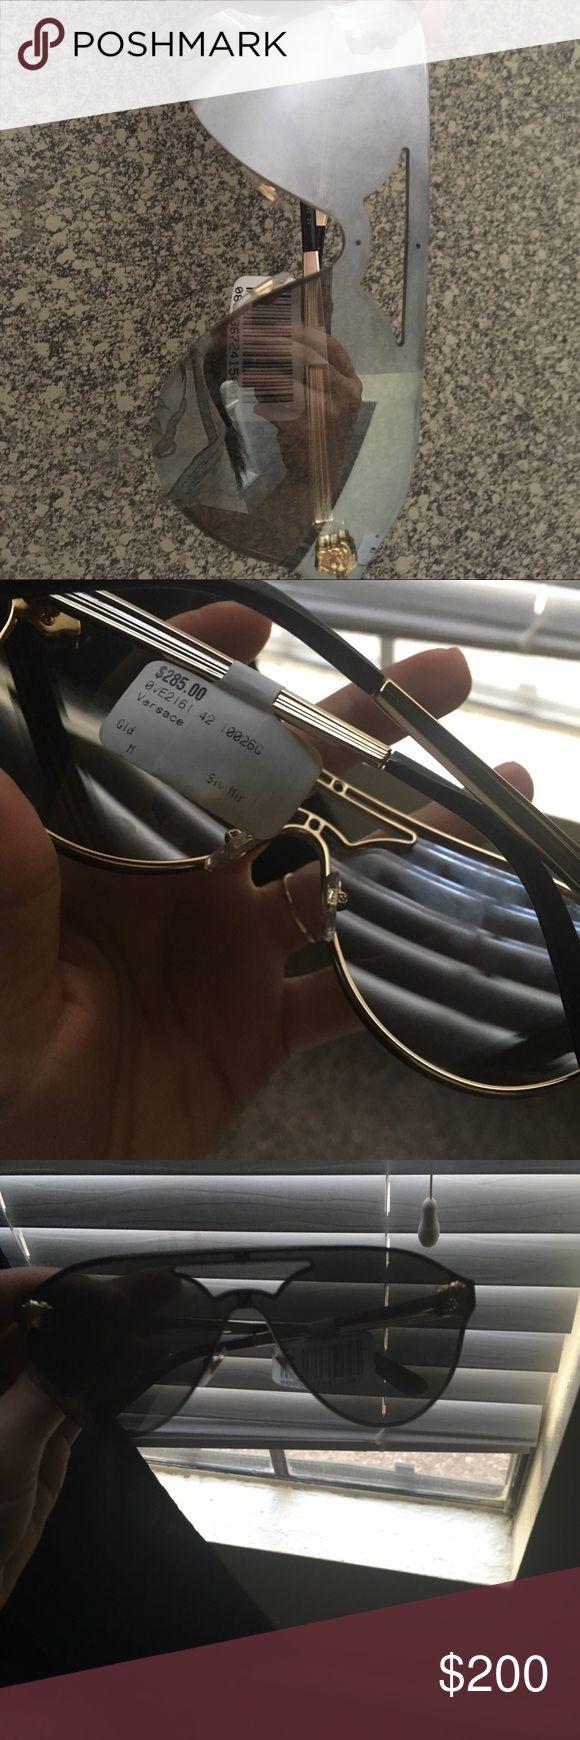 Versace Brand new Versace Accessories Glasses